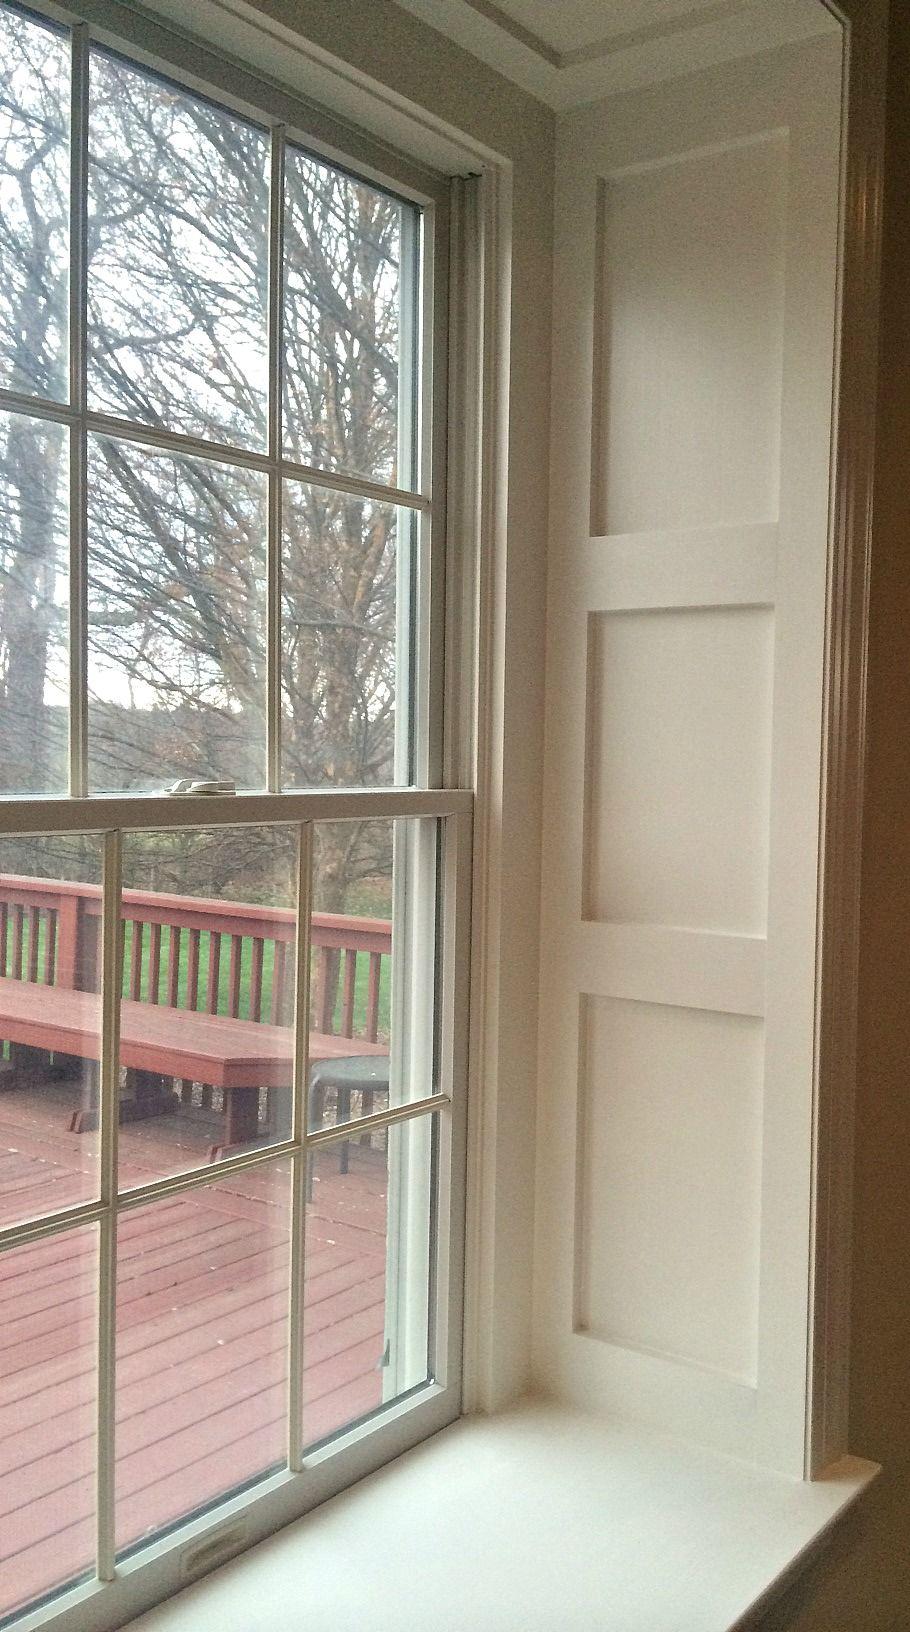 Interior window sill trim ideas - Wainscoting Around Window Sill Deep Window Sill